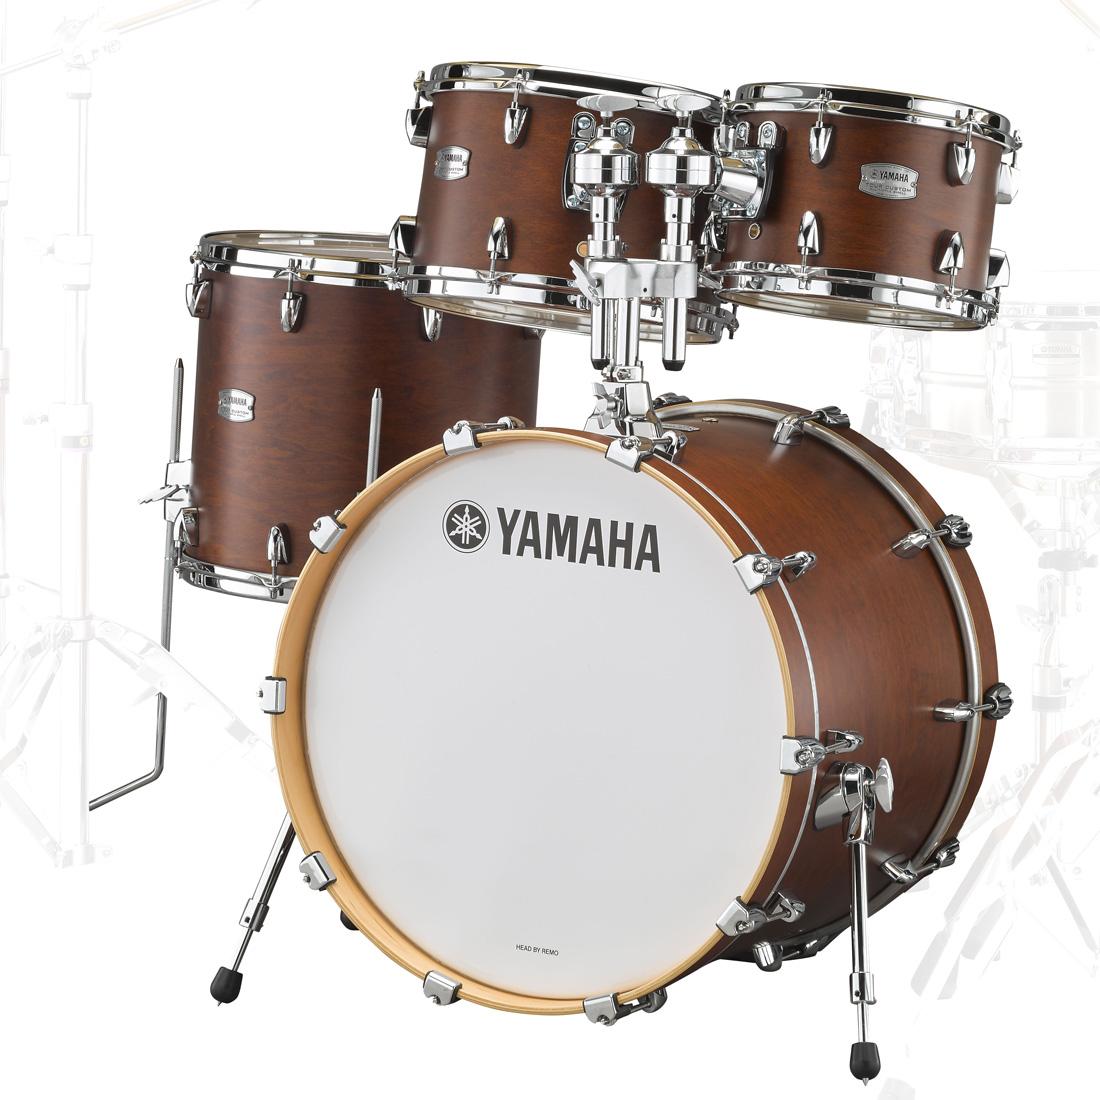 YAMAHA / TMP0F4CHS ヤマハ Tour Custom ドラムシェルパック 20BD チョコレートサテン【お取り寄せ商品】